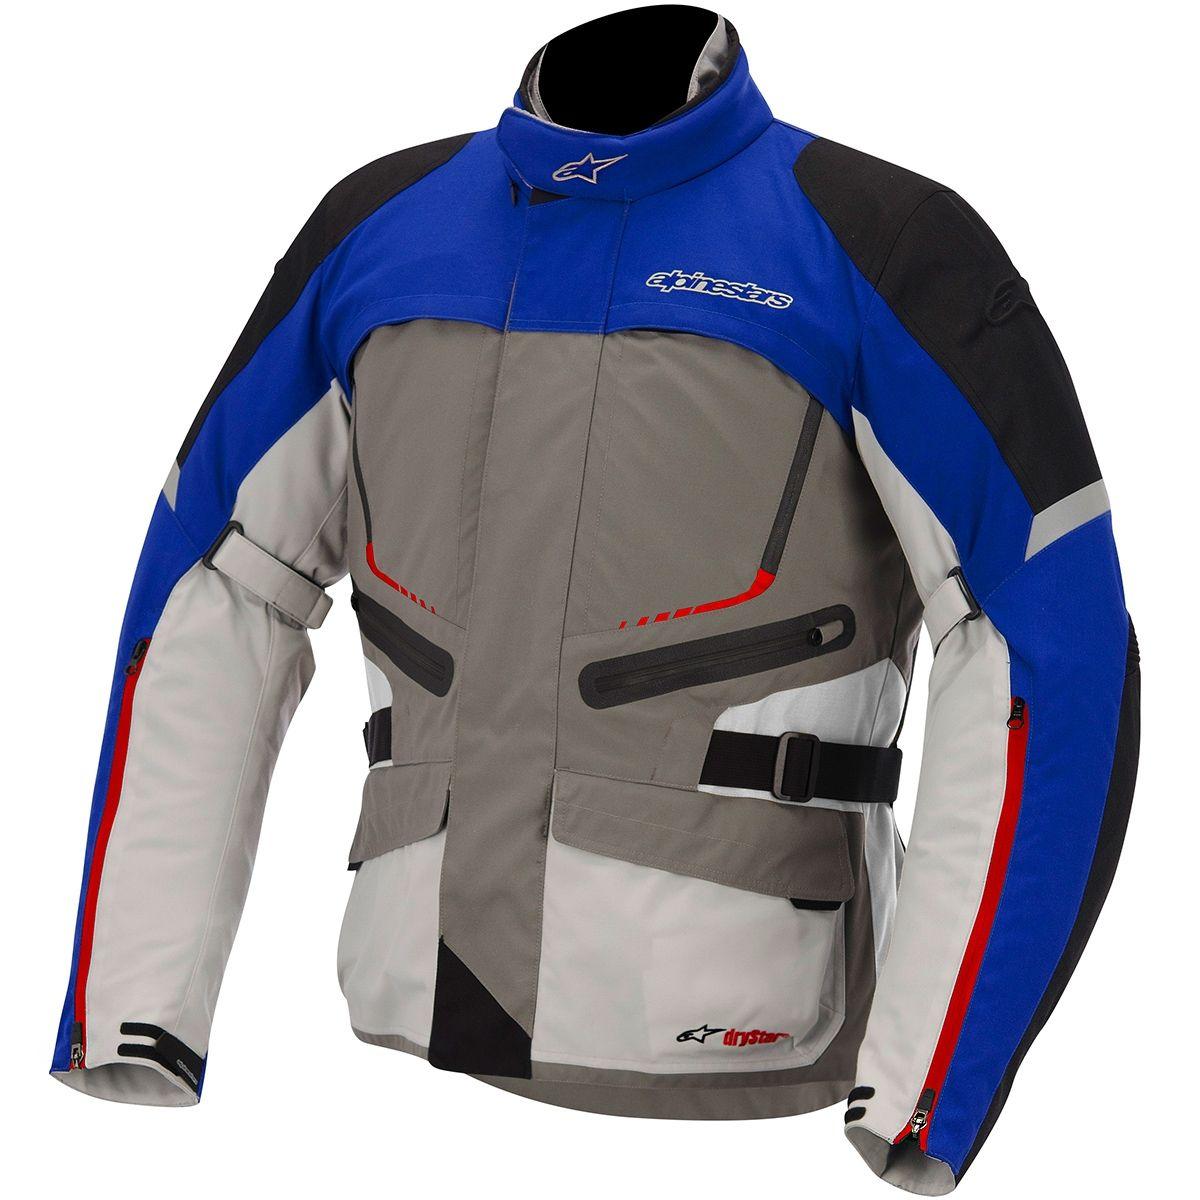 Jaqueta Moto Trail Alpinestars Valparaiso Impermeável Drystar Azul - Masada  Moto Jaqueta Motociclista 16681f74884